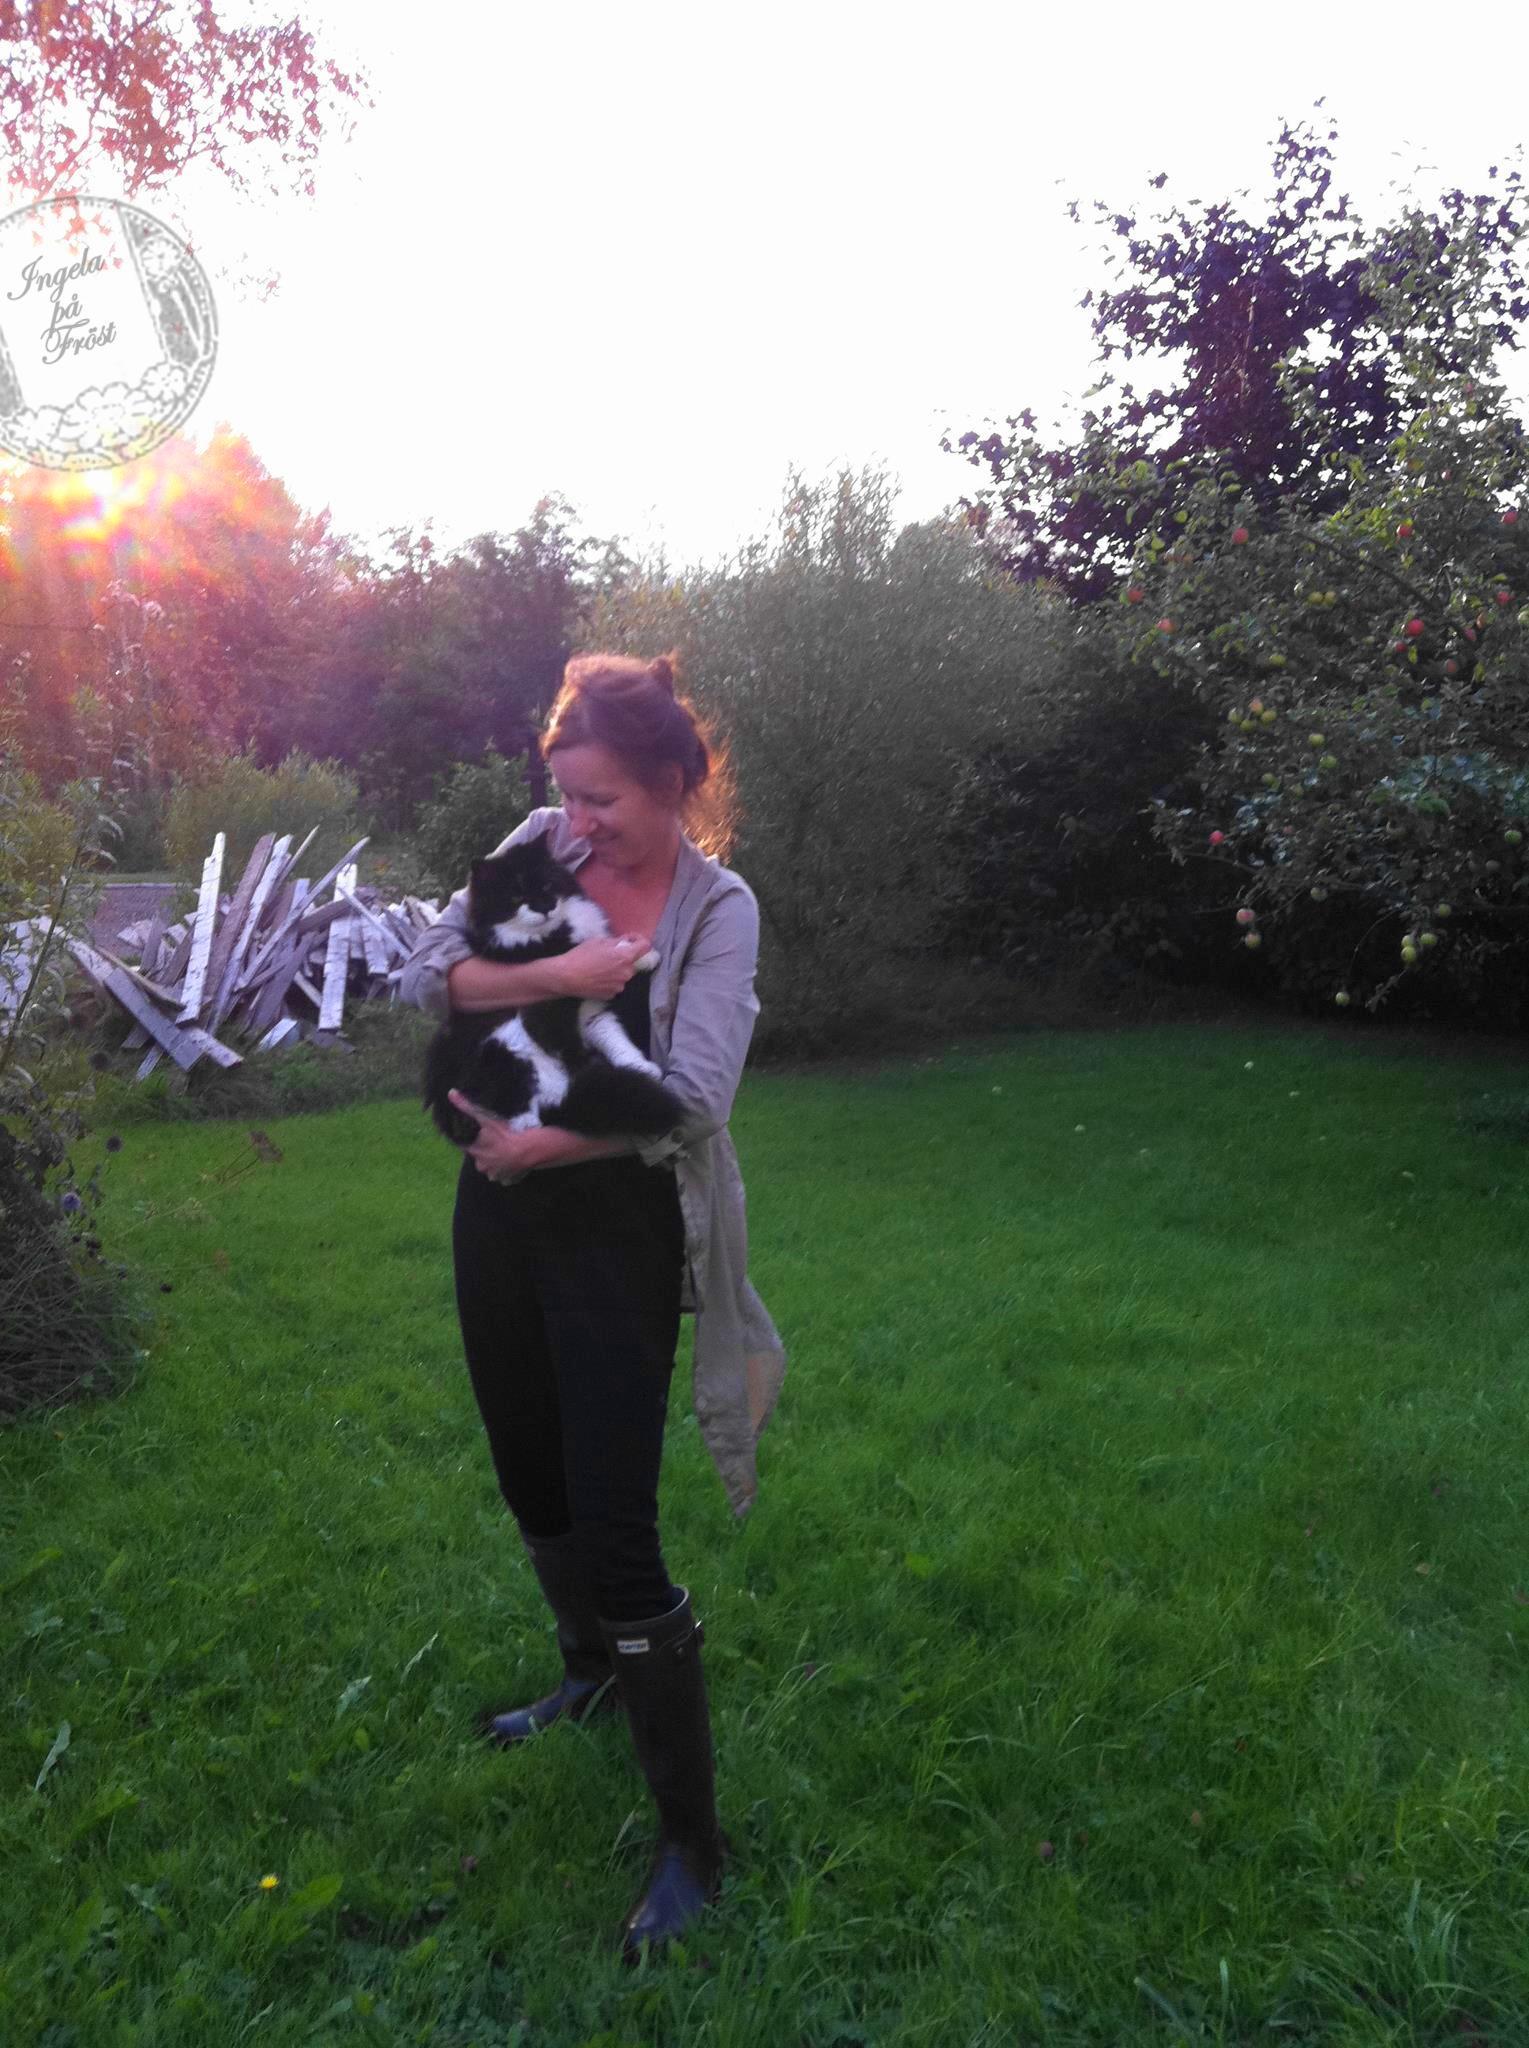 Max-katten. Katter barometer inredare hemliv